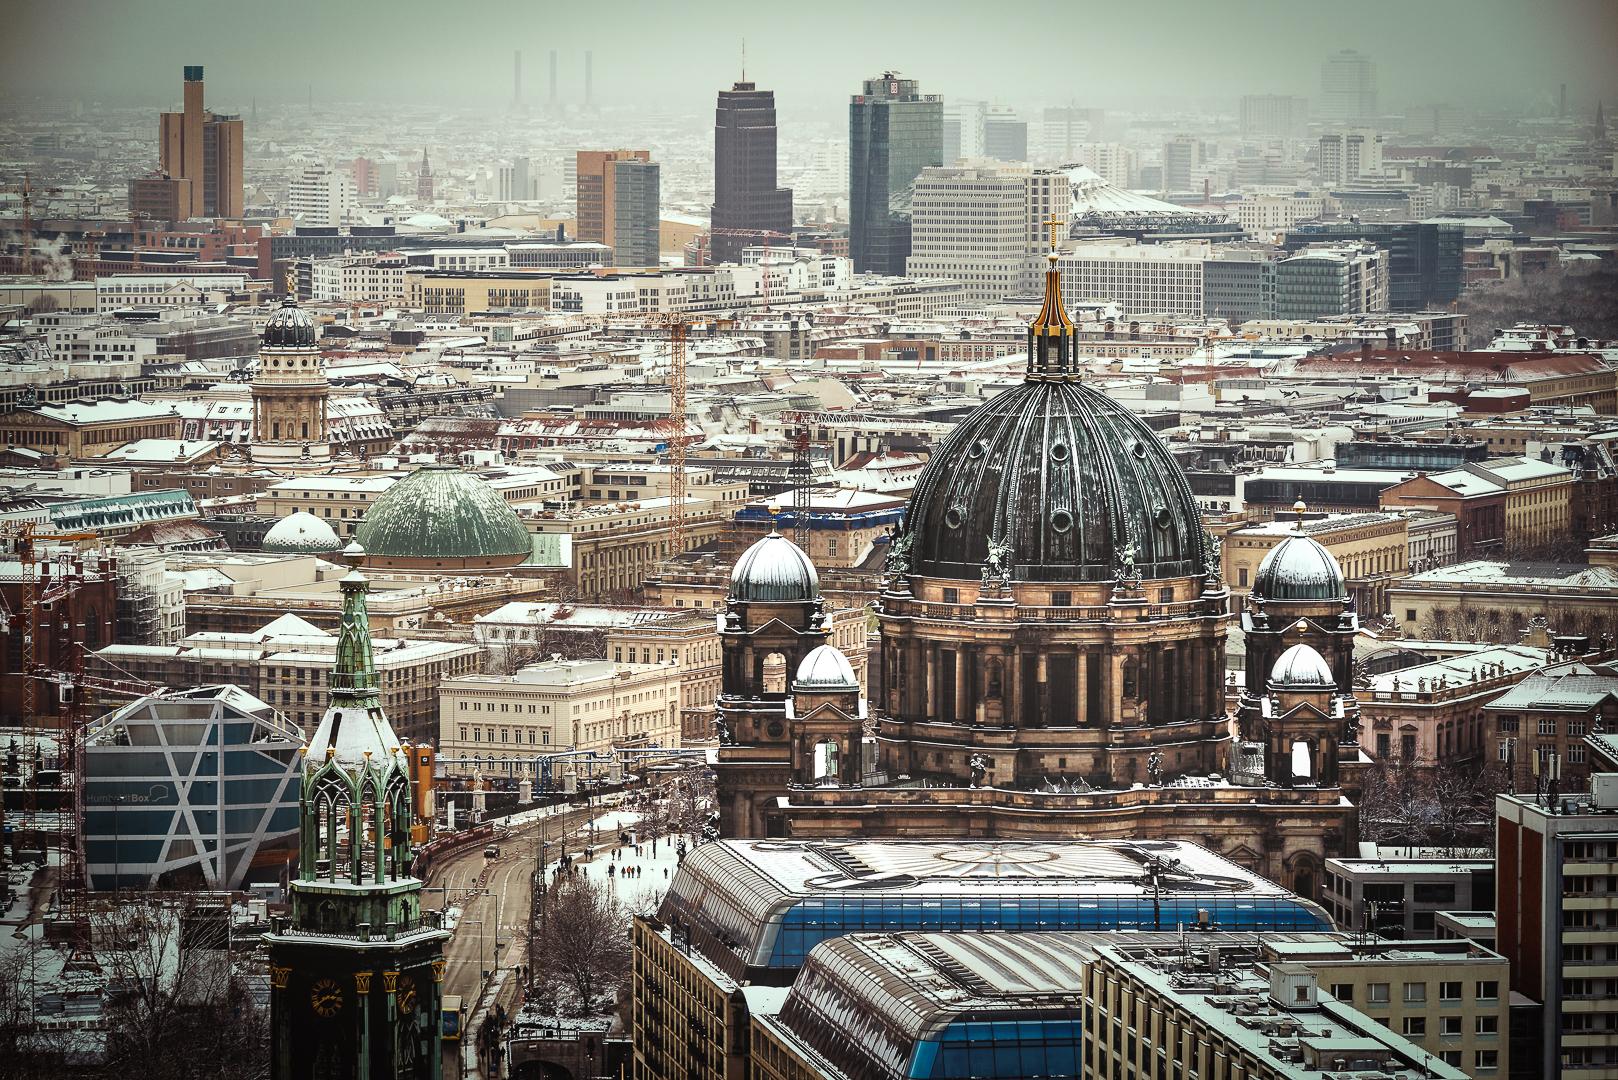 Berlin, Berliner Dom, Winter's Day, 2016, Skyline, panorama, Potsdamer Platz,